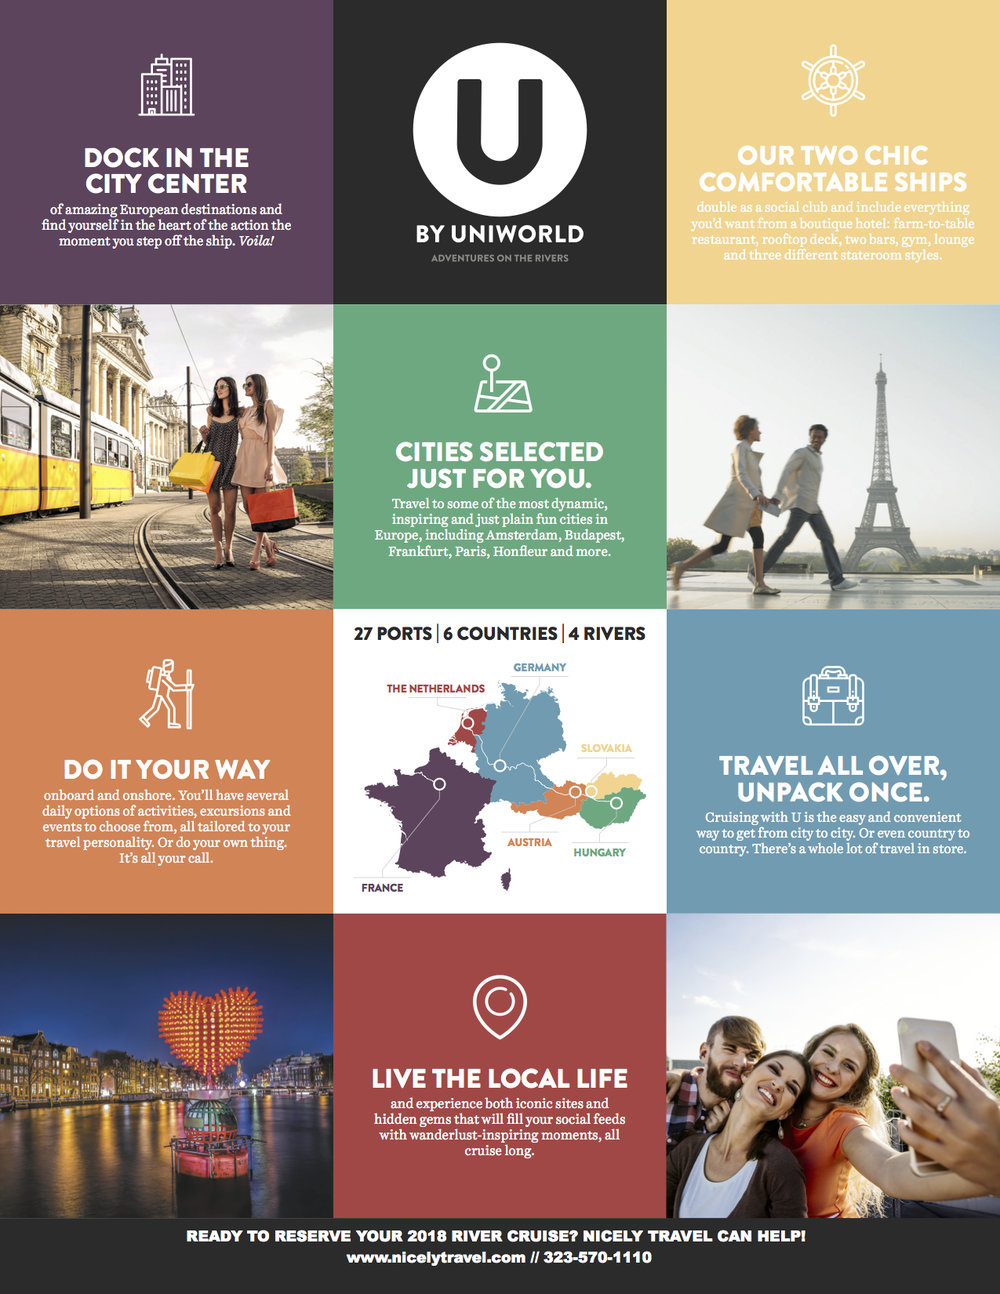 U by Uniworld informational flyer